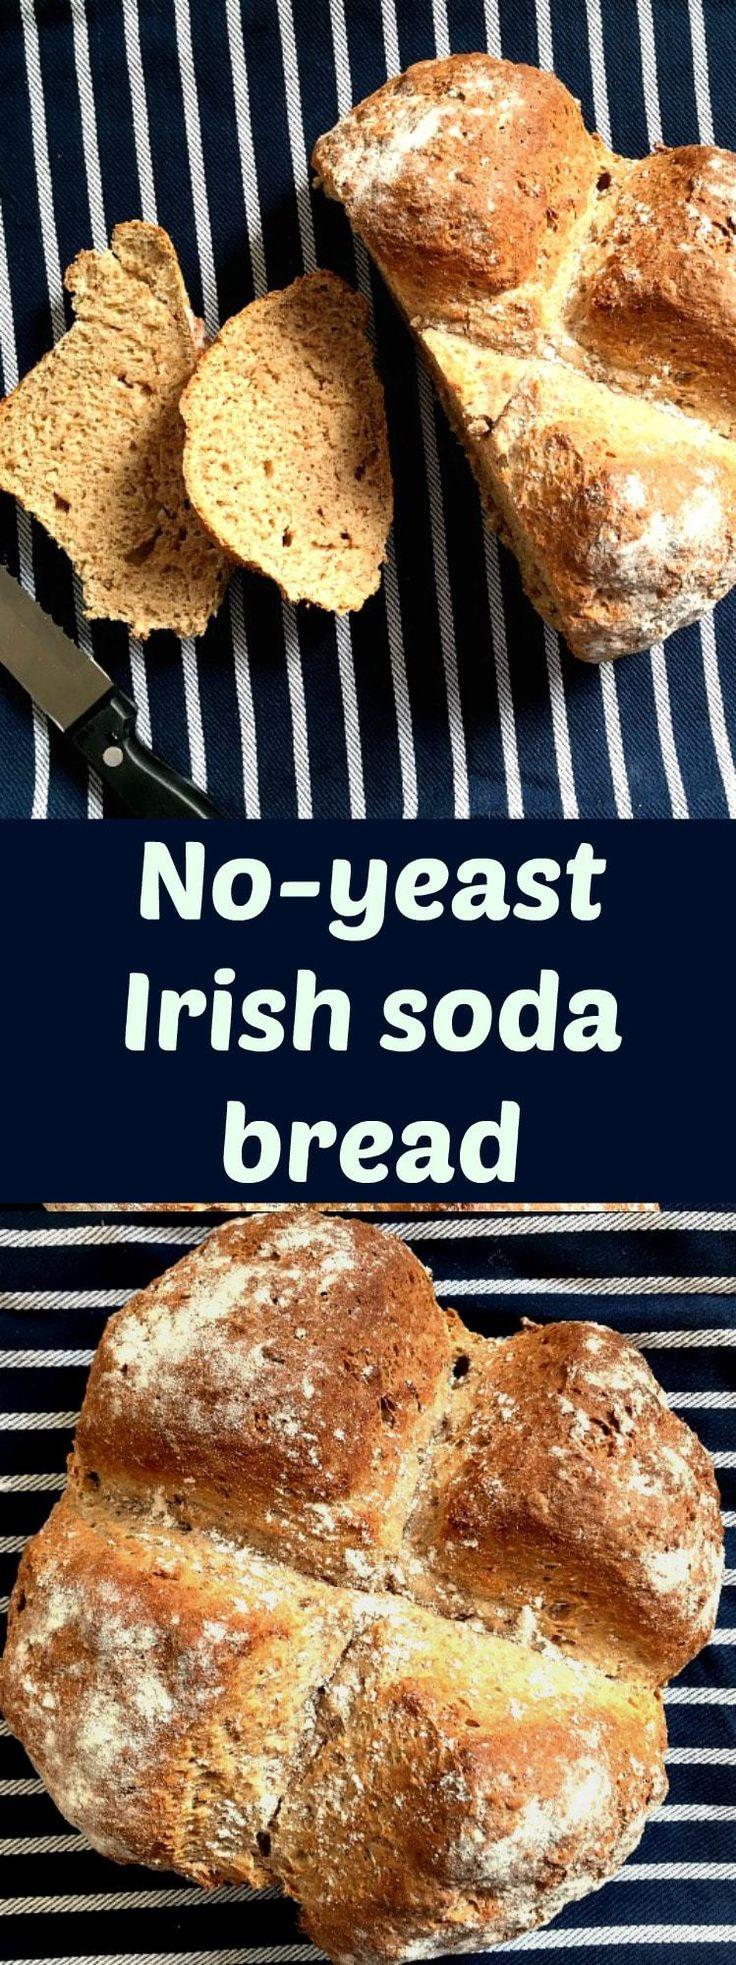 No-yeast Irish soda bread